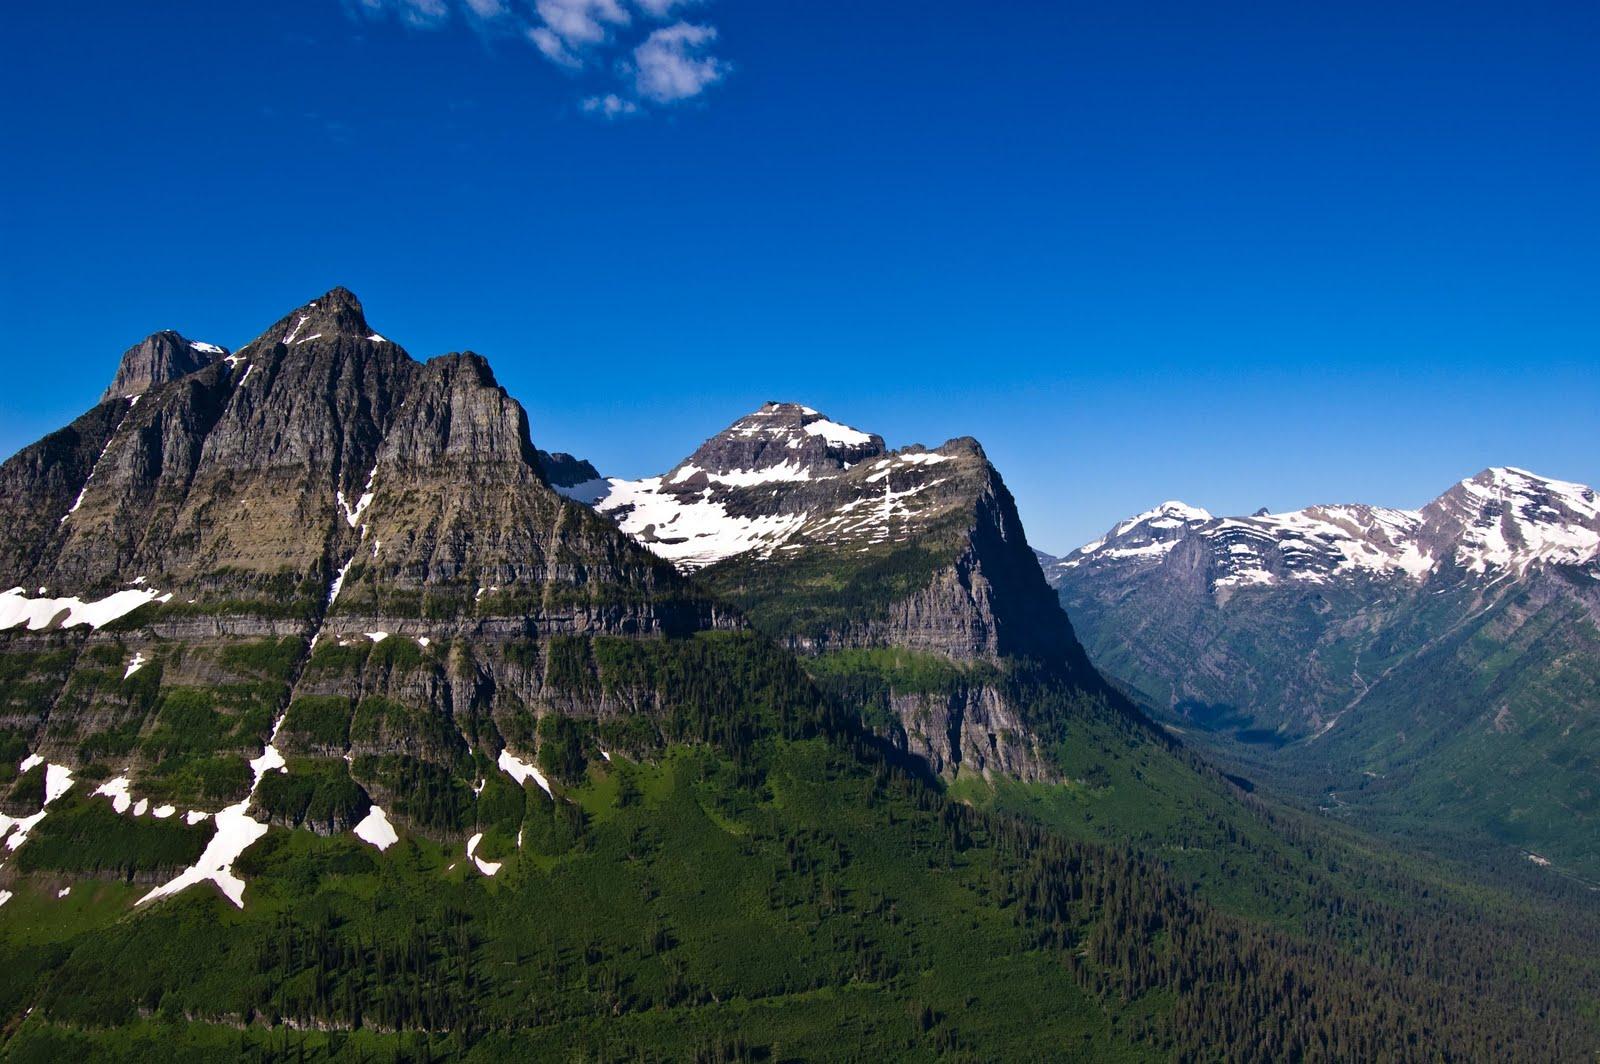 glacier national park photo - photo #28